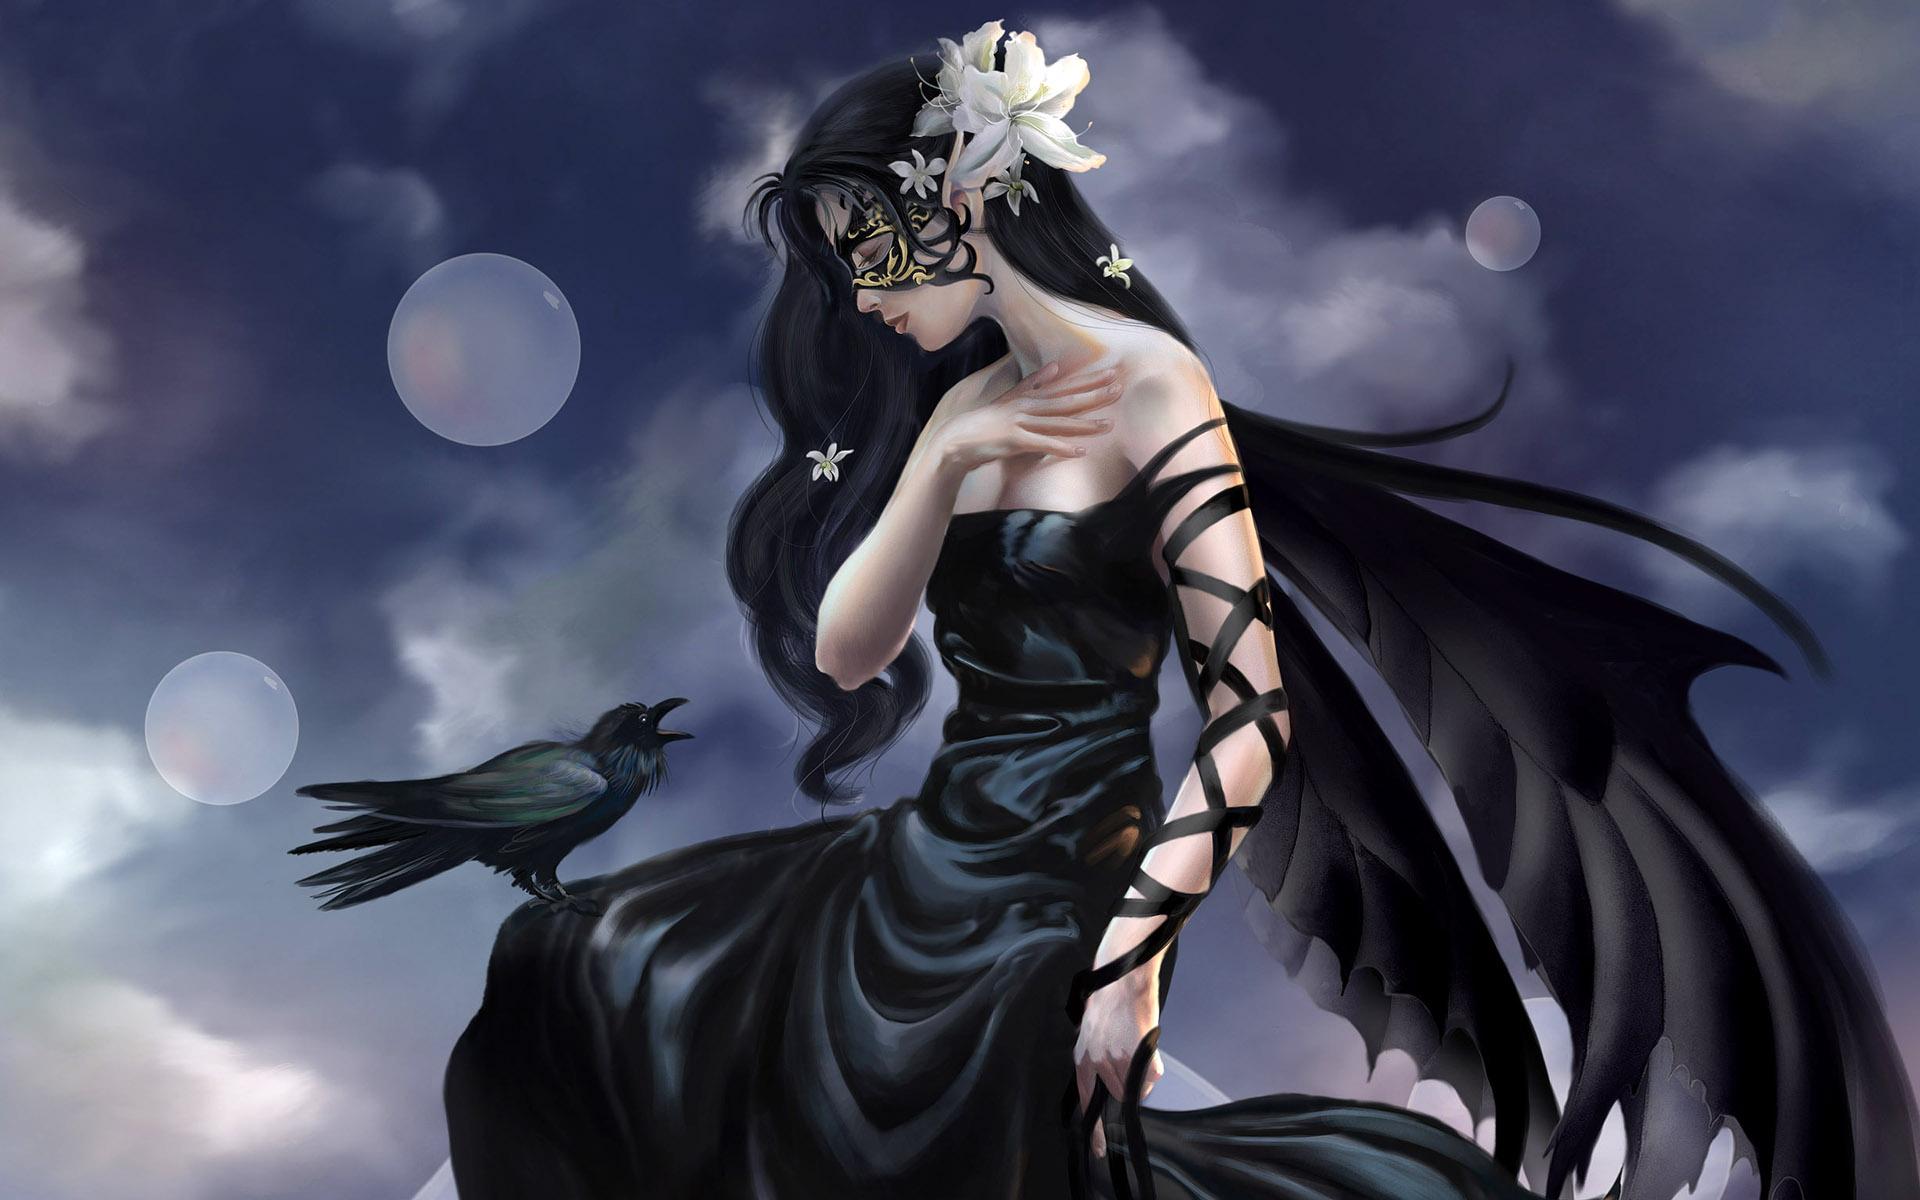 fantasy girl   raven wallpapers 15023 1920x1200jpg 1920x1200